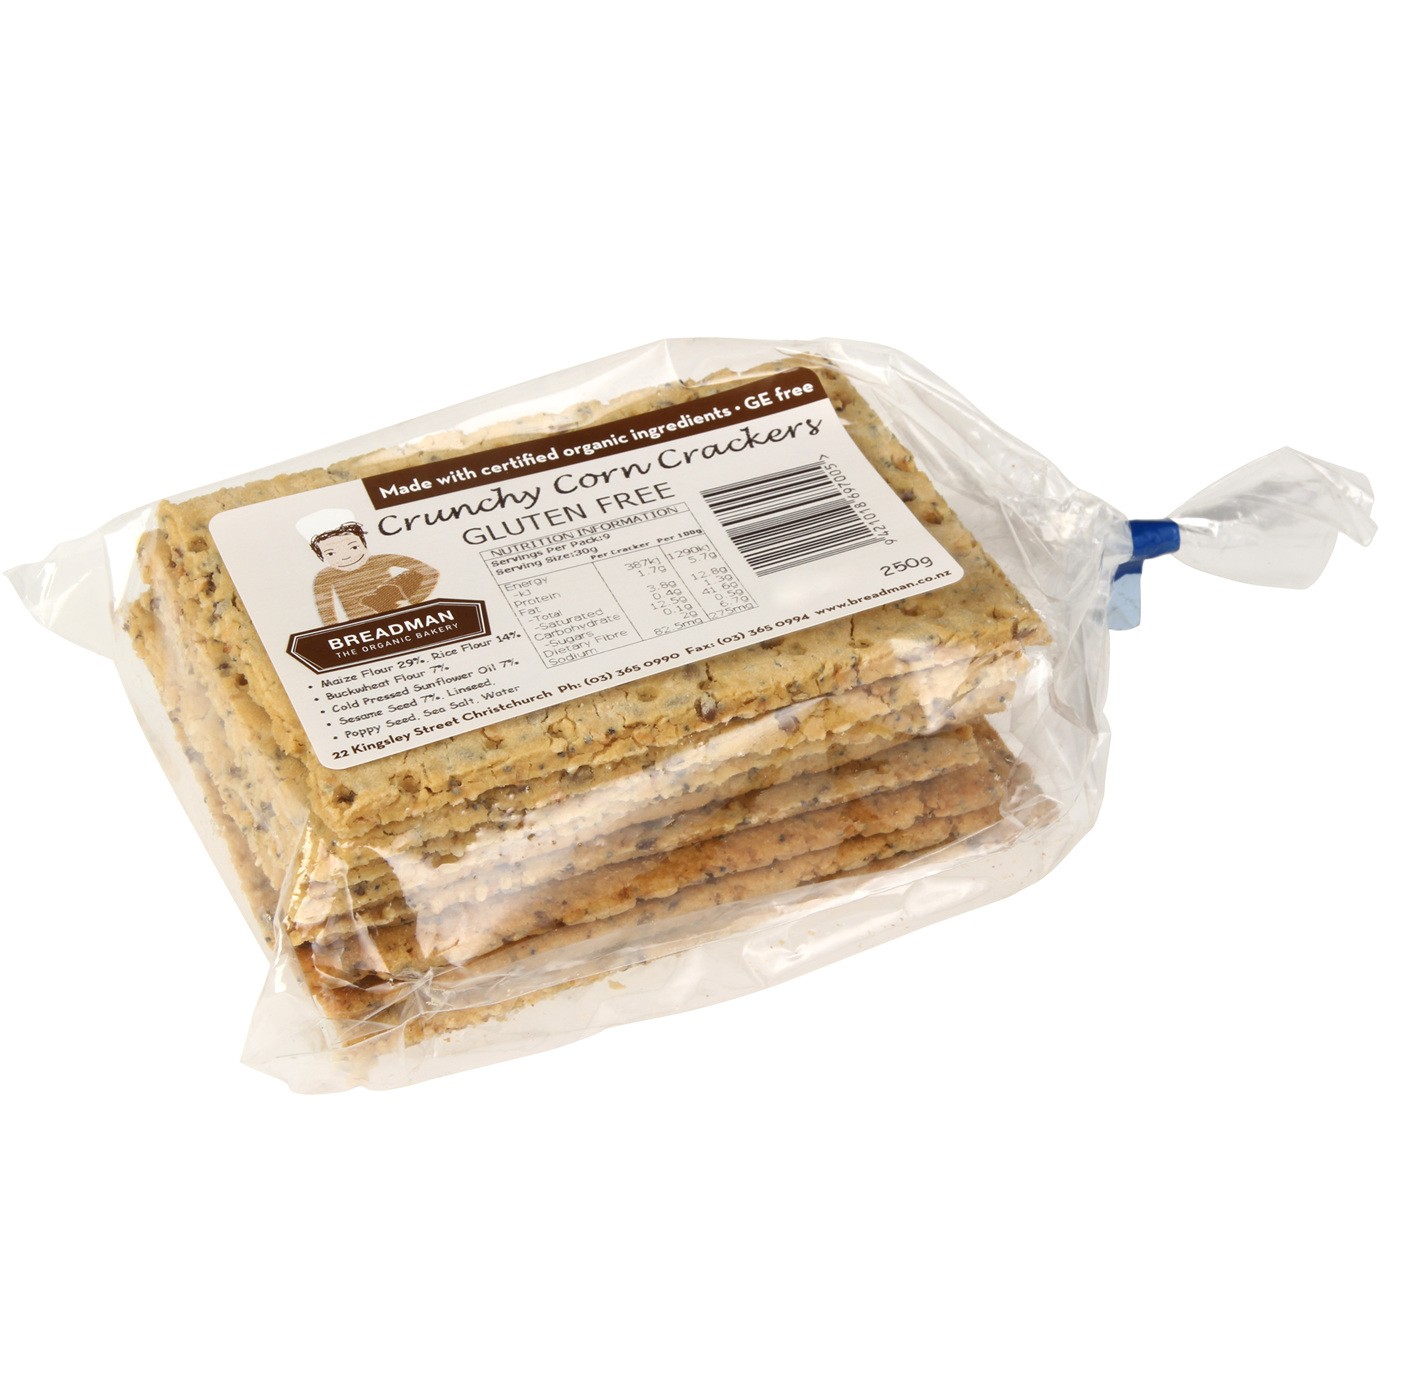 corn crackers bagged